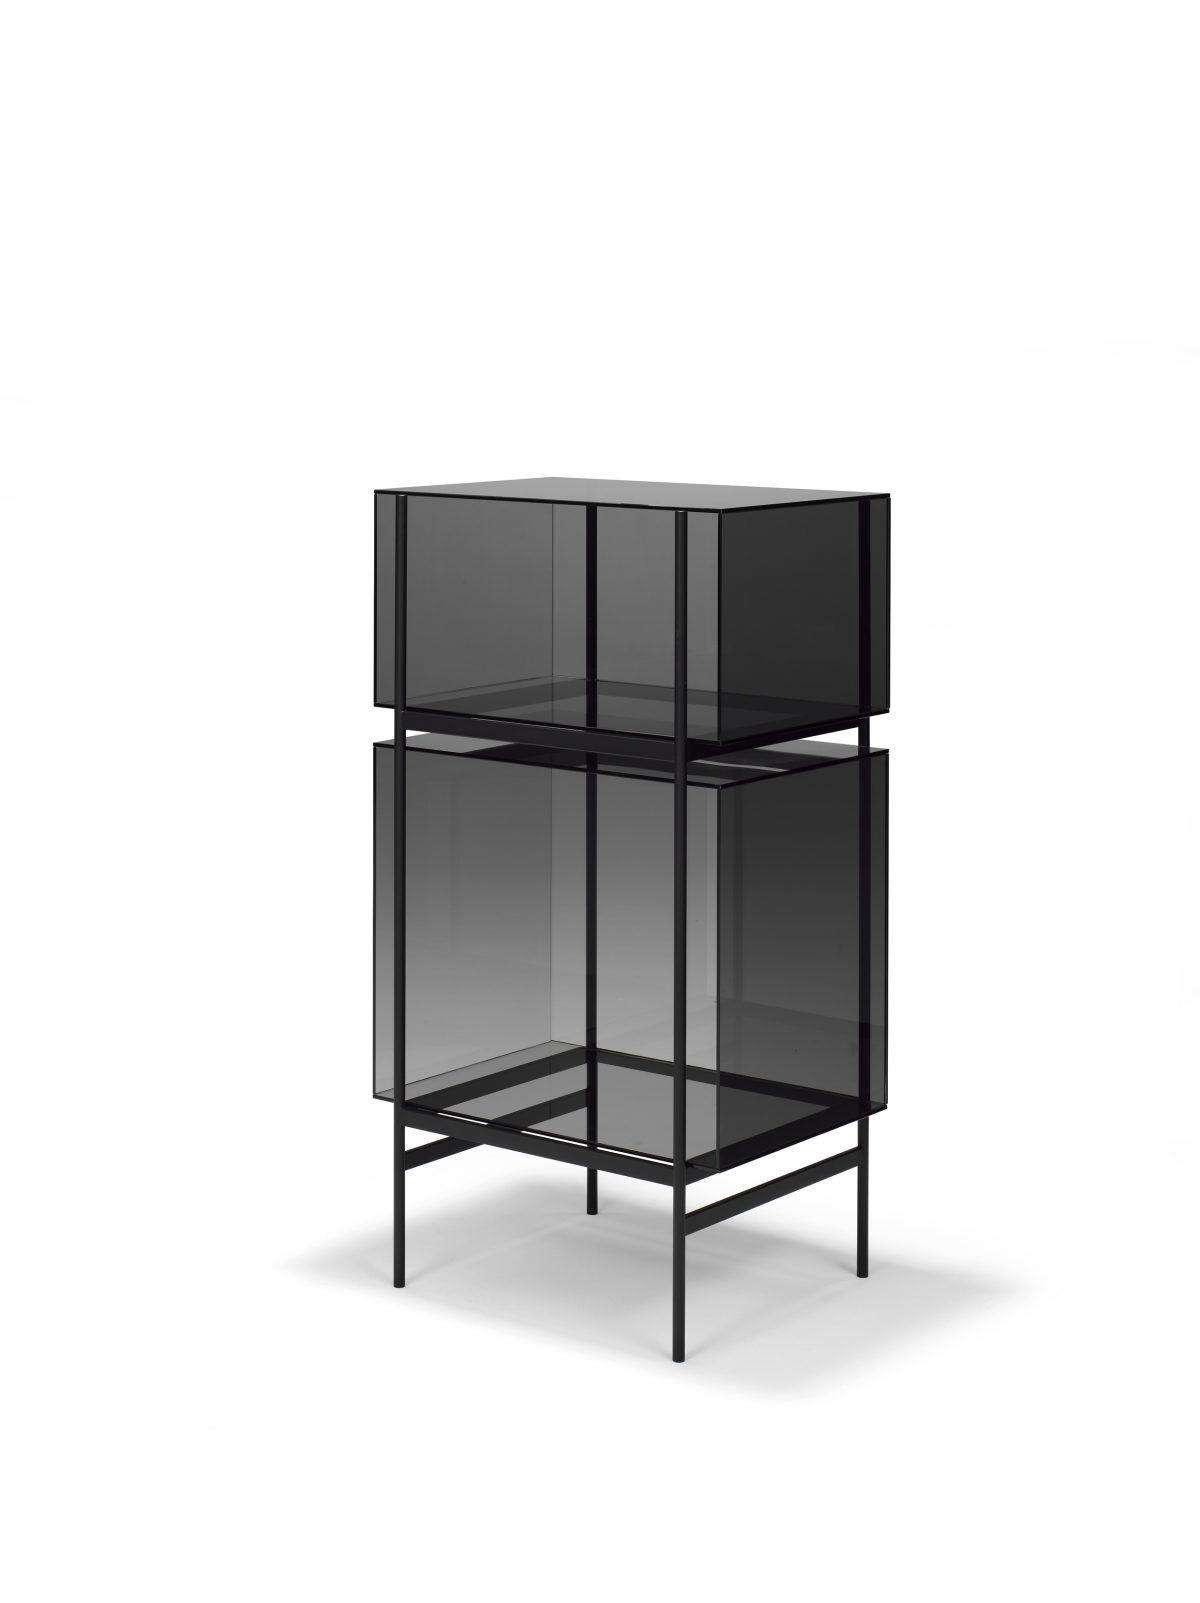 Kast LYN 2 Vakken Visser Meijwaard Exclusief Dutchdesign Zwart Frame Grijs Glas JOSHH& Helderr 18